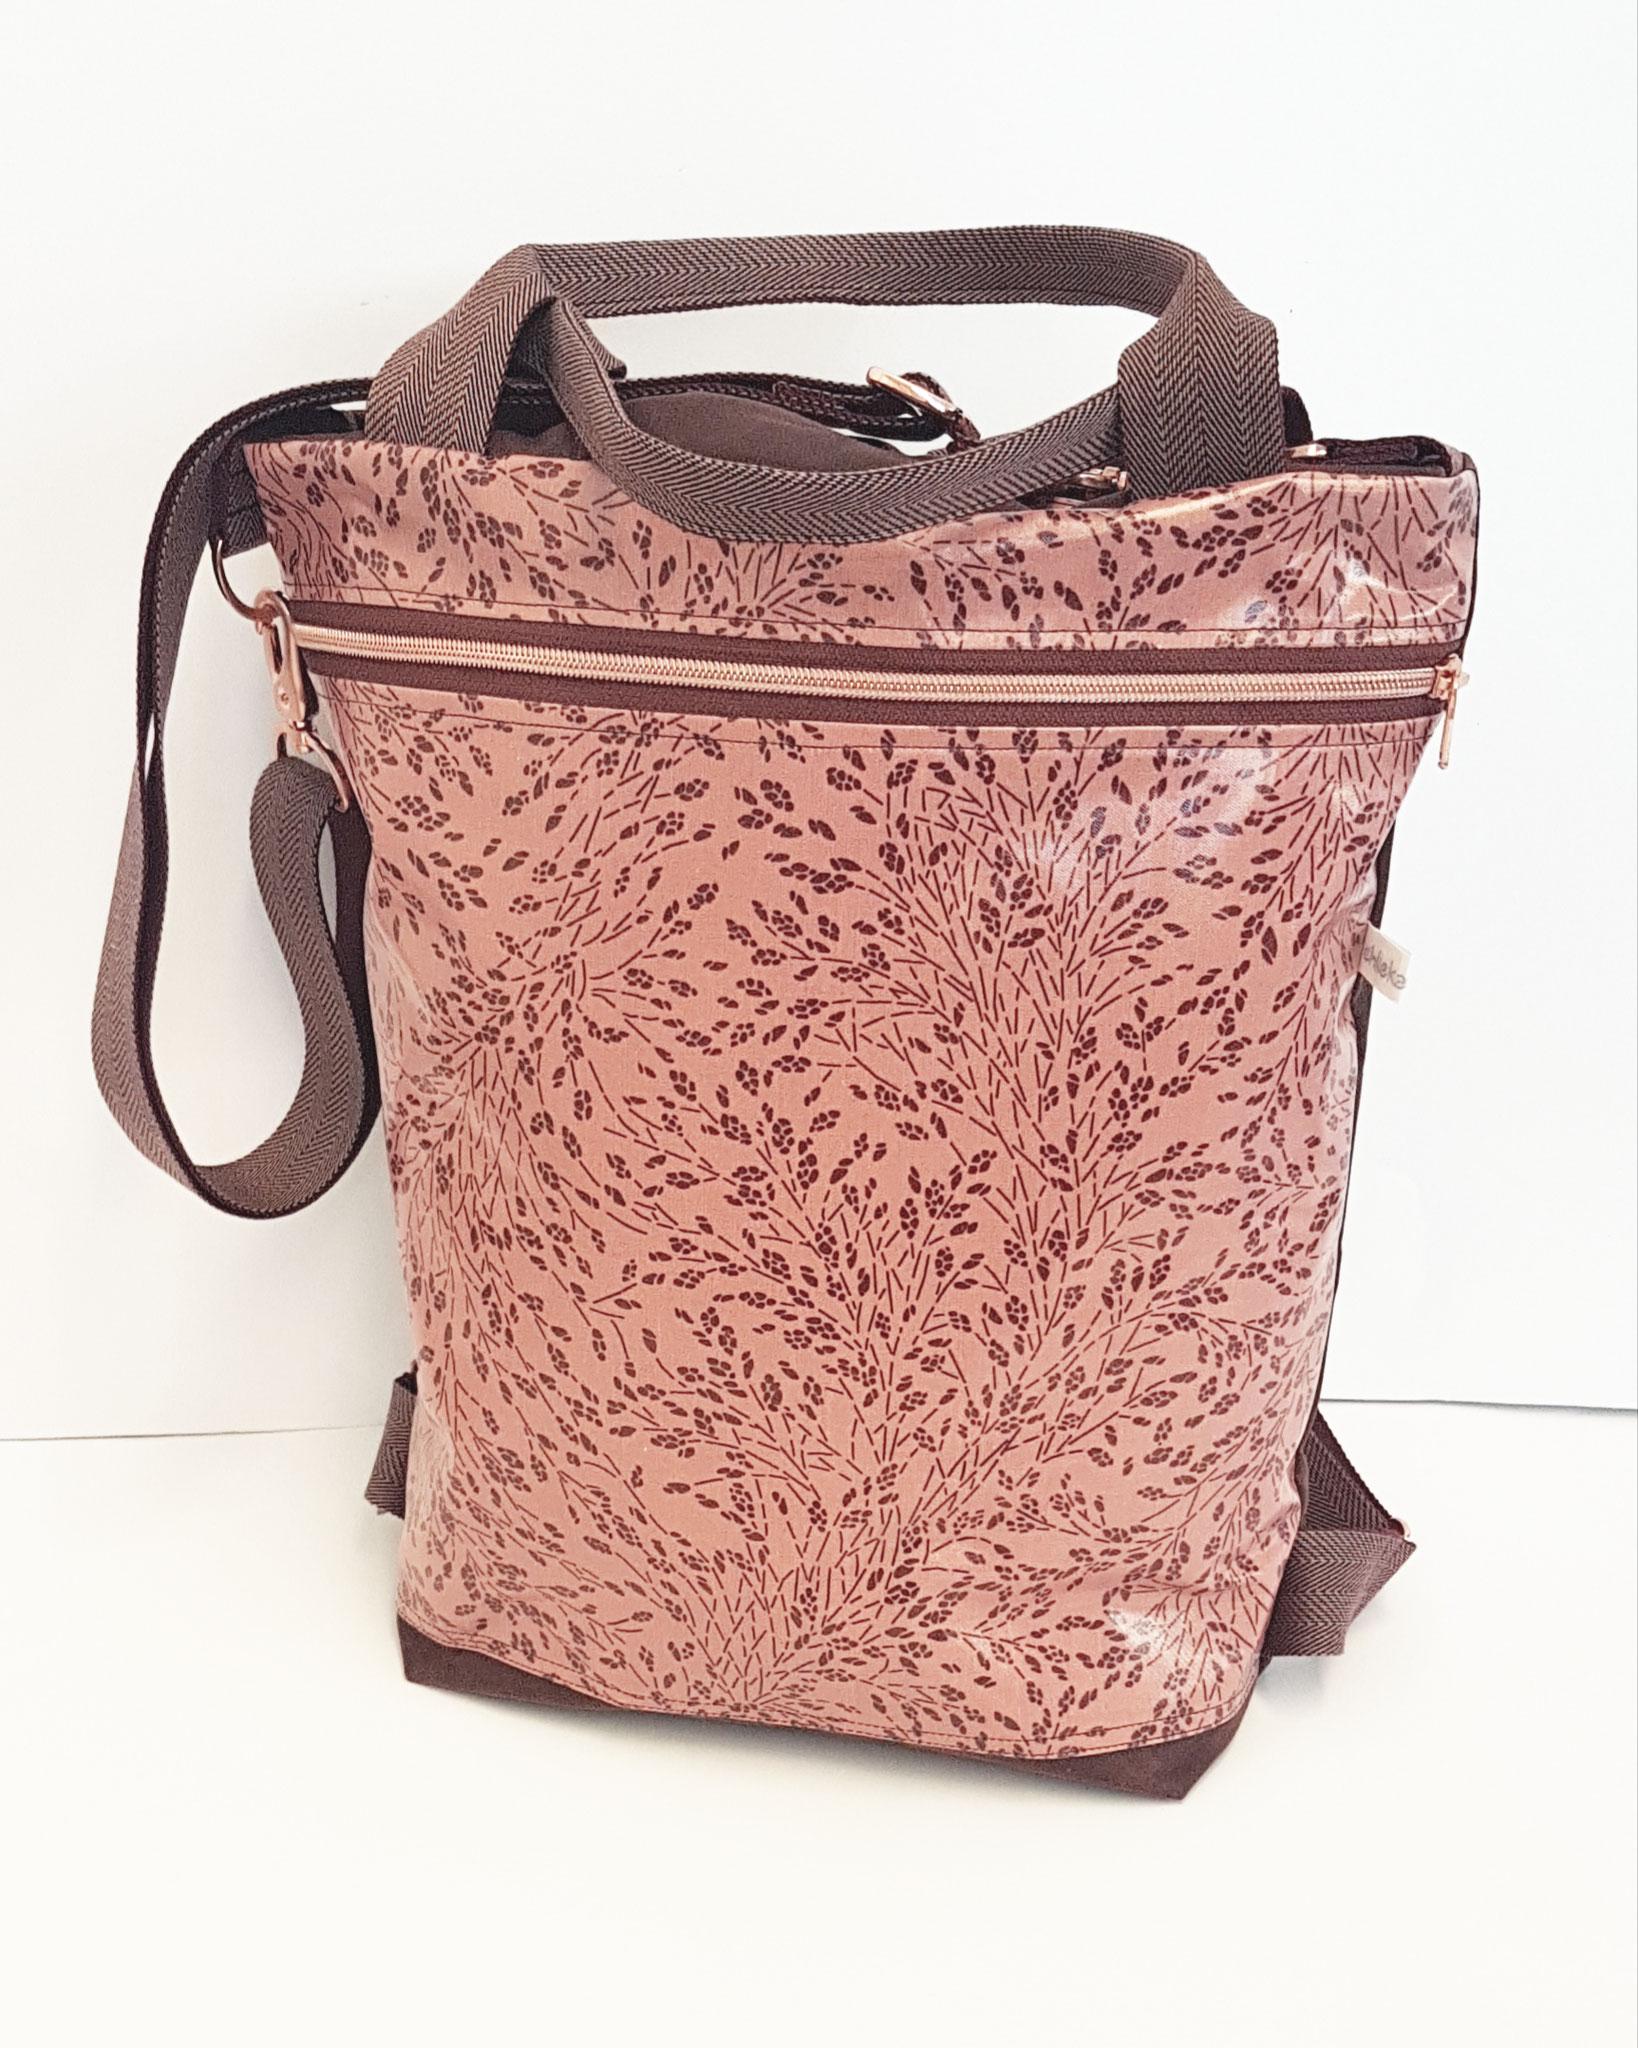 3in1 Bag L, verkauft